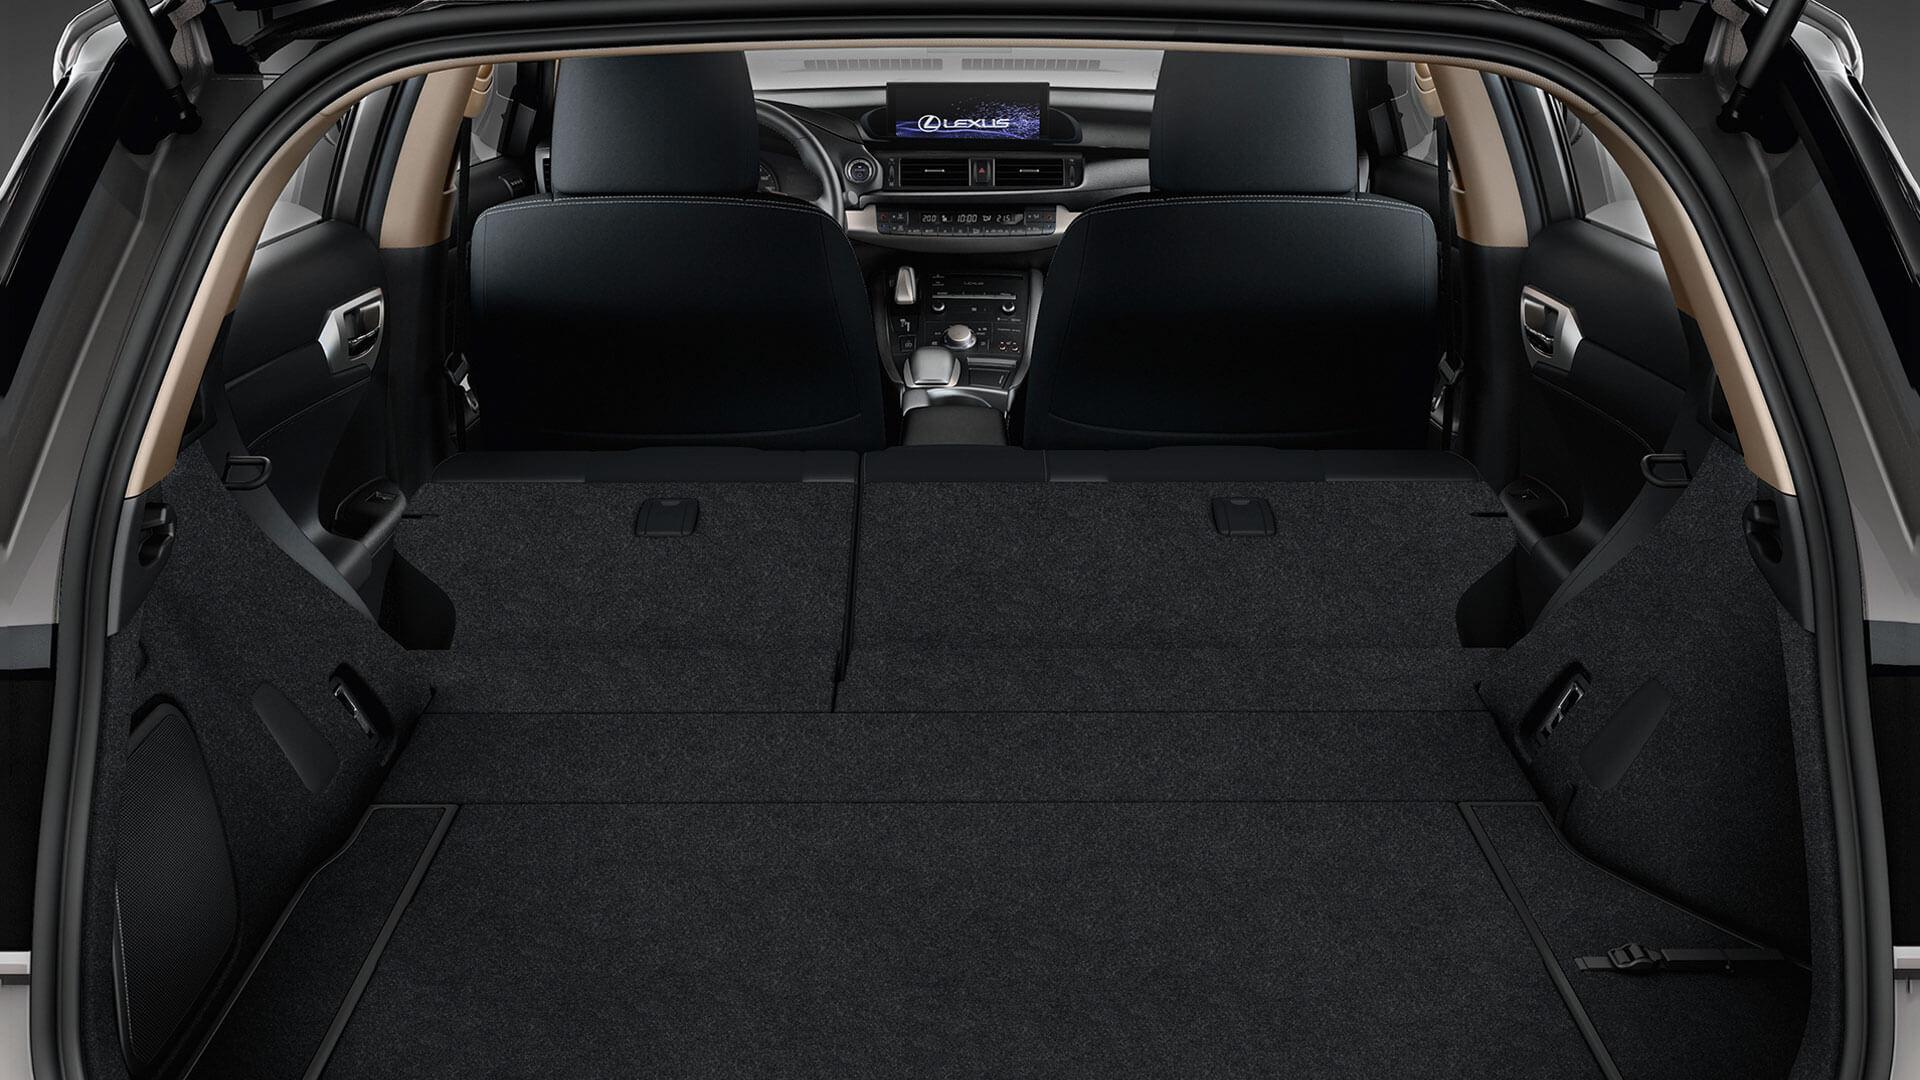 2018 lexus ct 200h my18 features compact flexibility